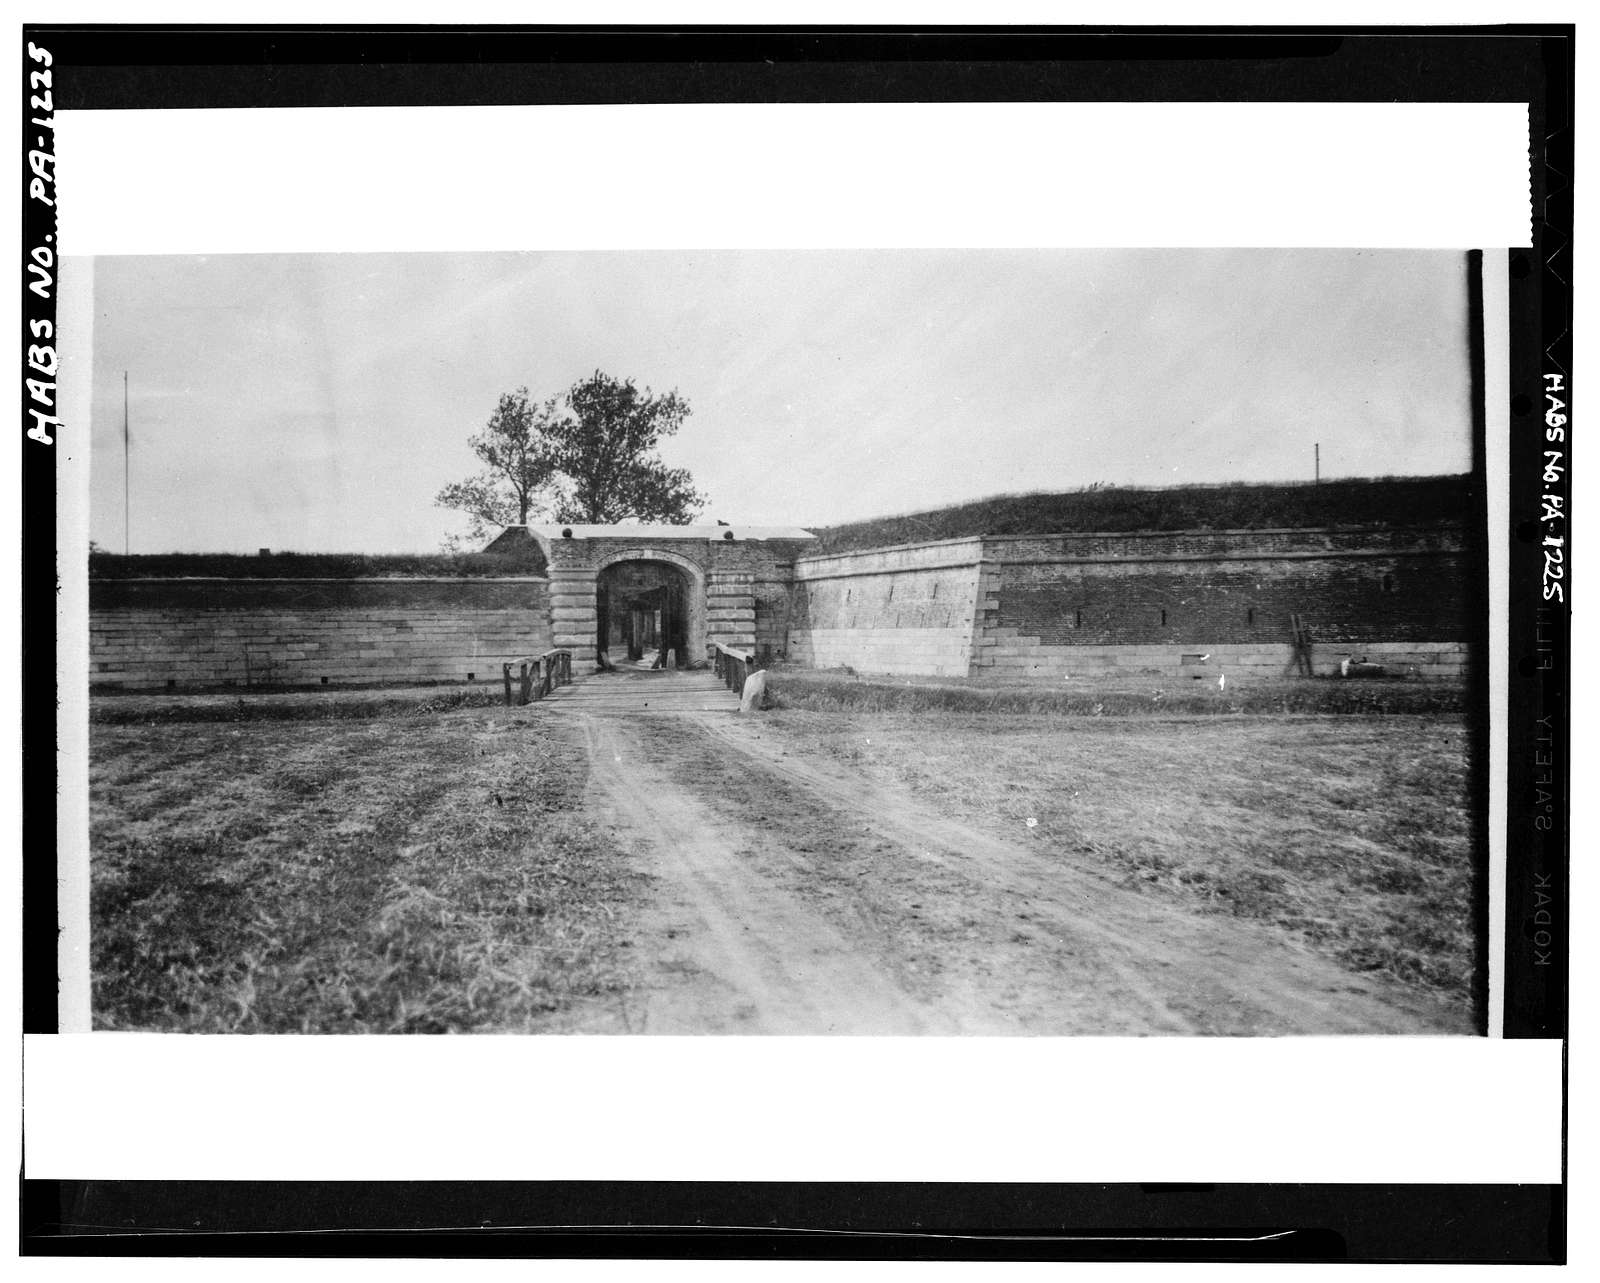 Fort Mifflin, Mud Island, Marine & Penrose Ferry Roads, Philadelphia, Philadelphia County, PA